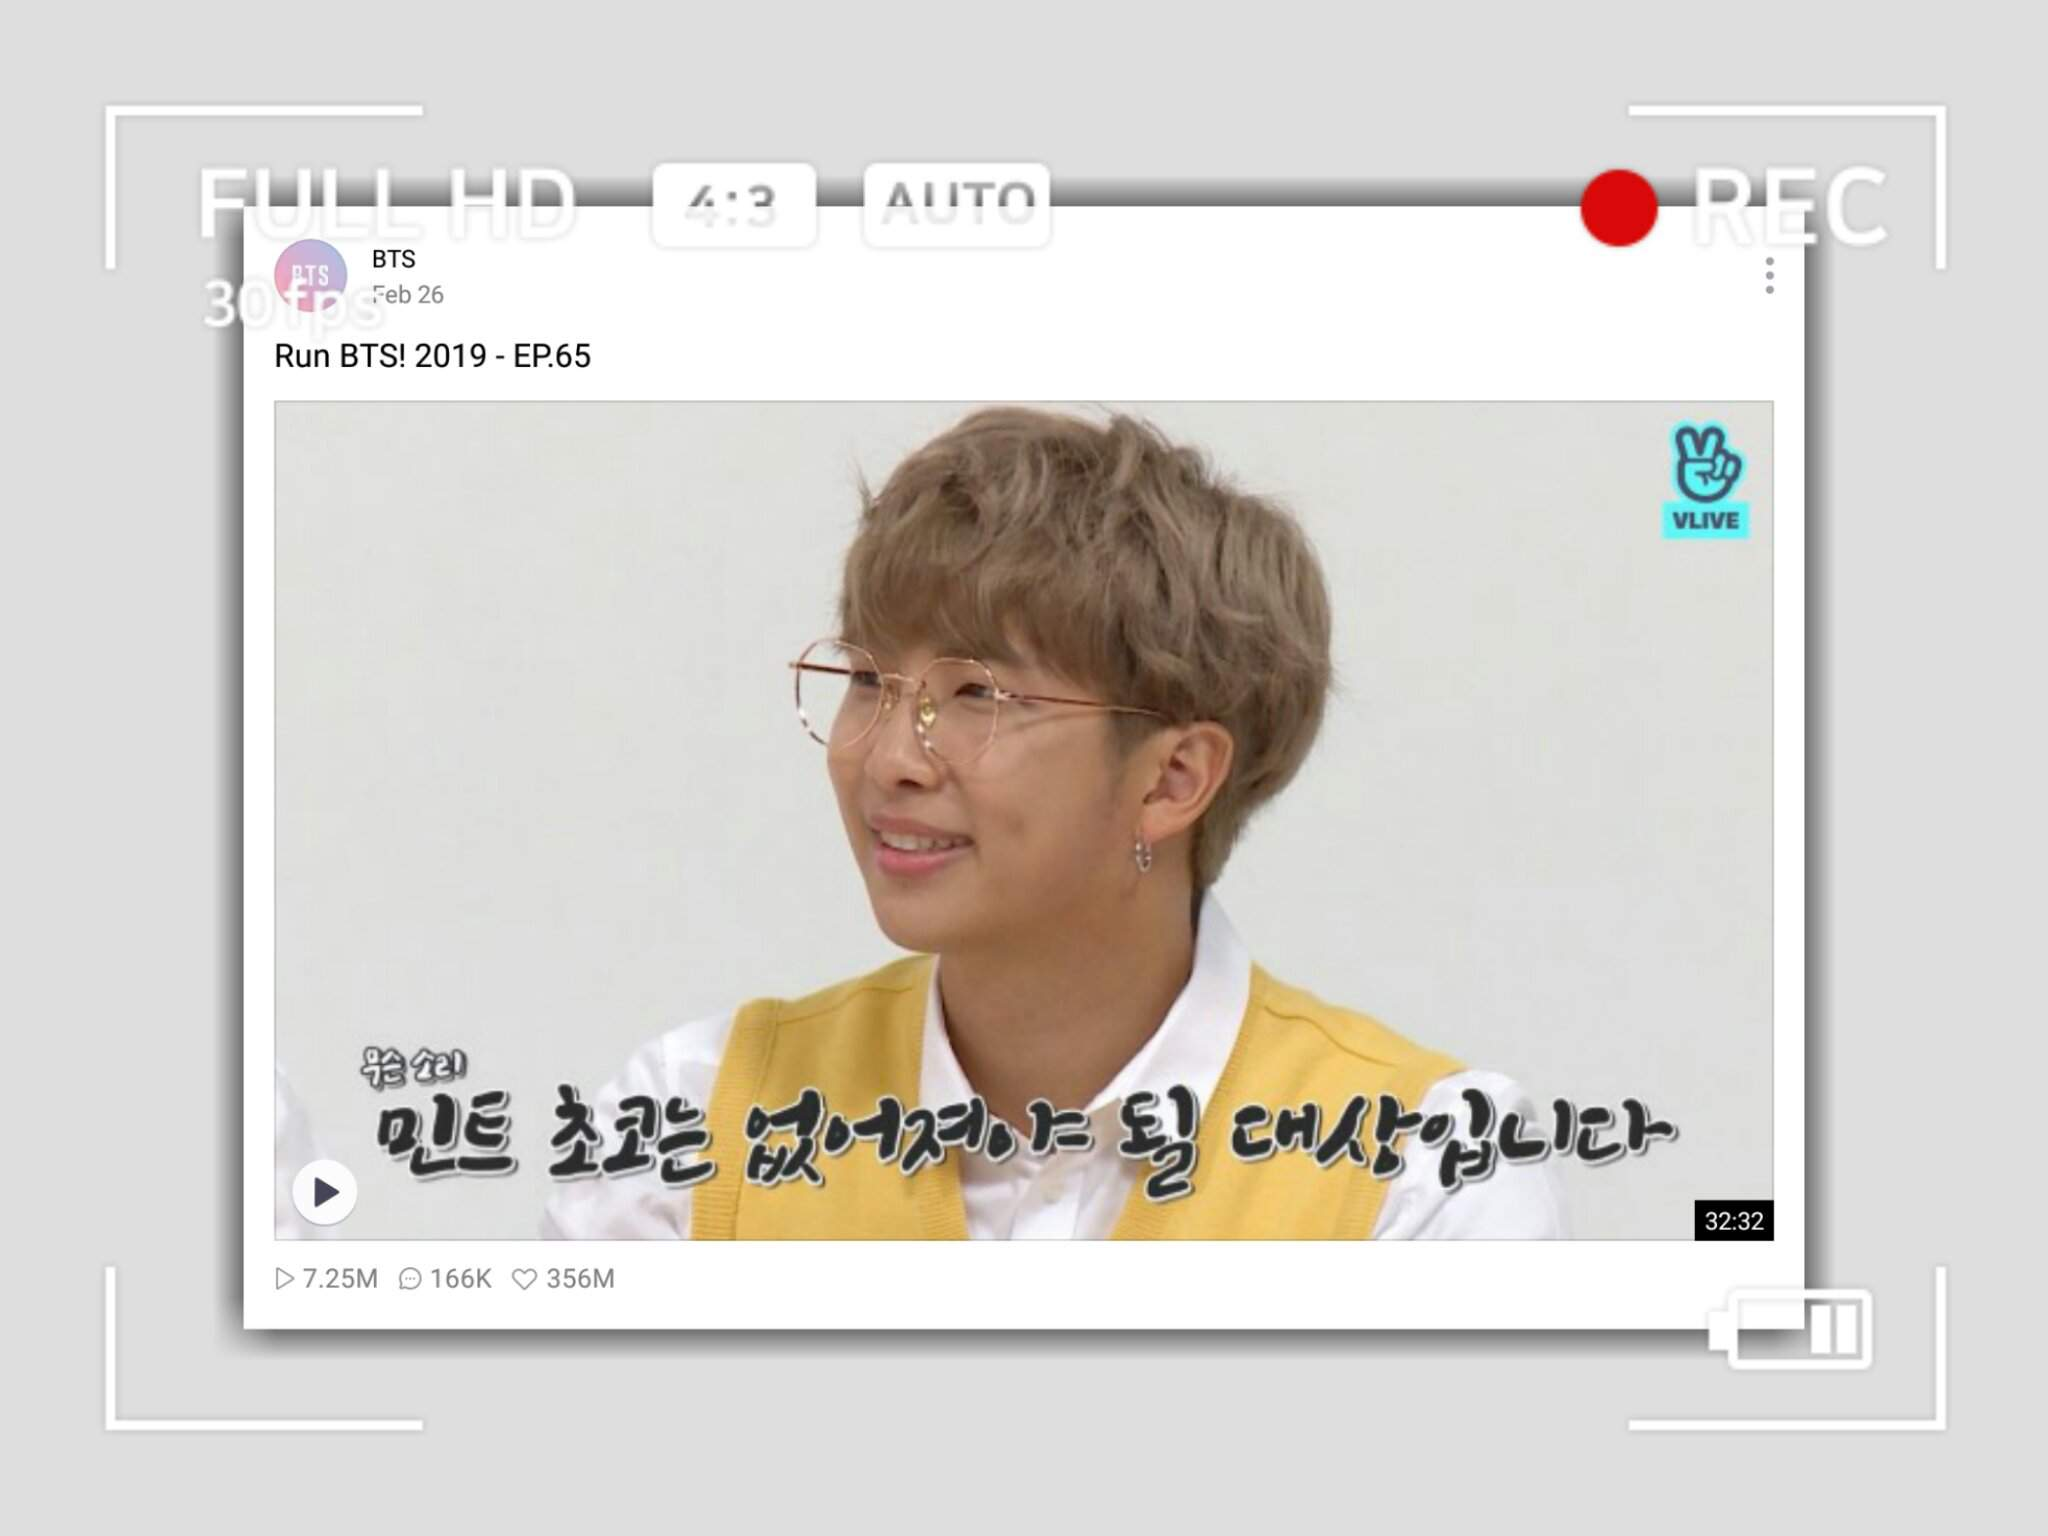 Run BTS Episode 67 : Watch Now! | ARMY's Amino